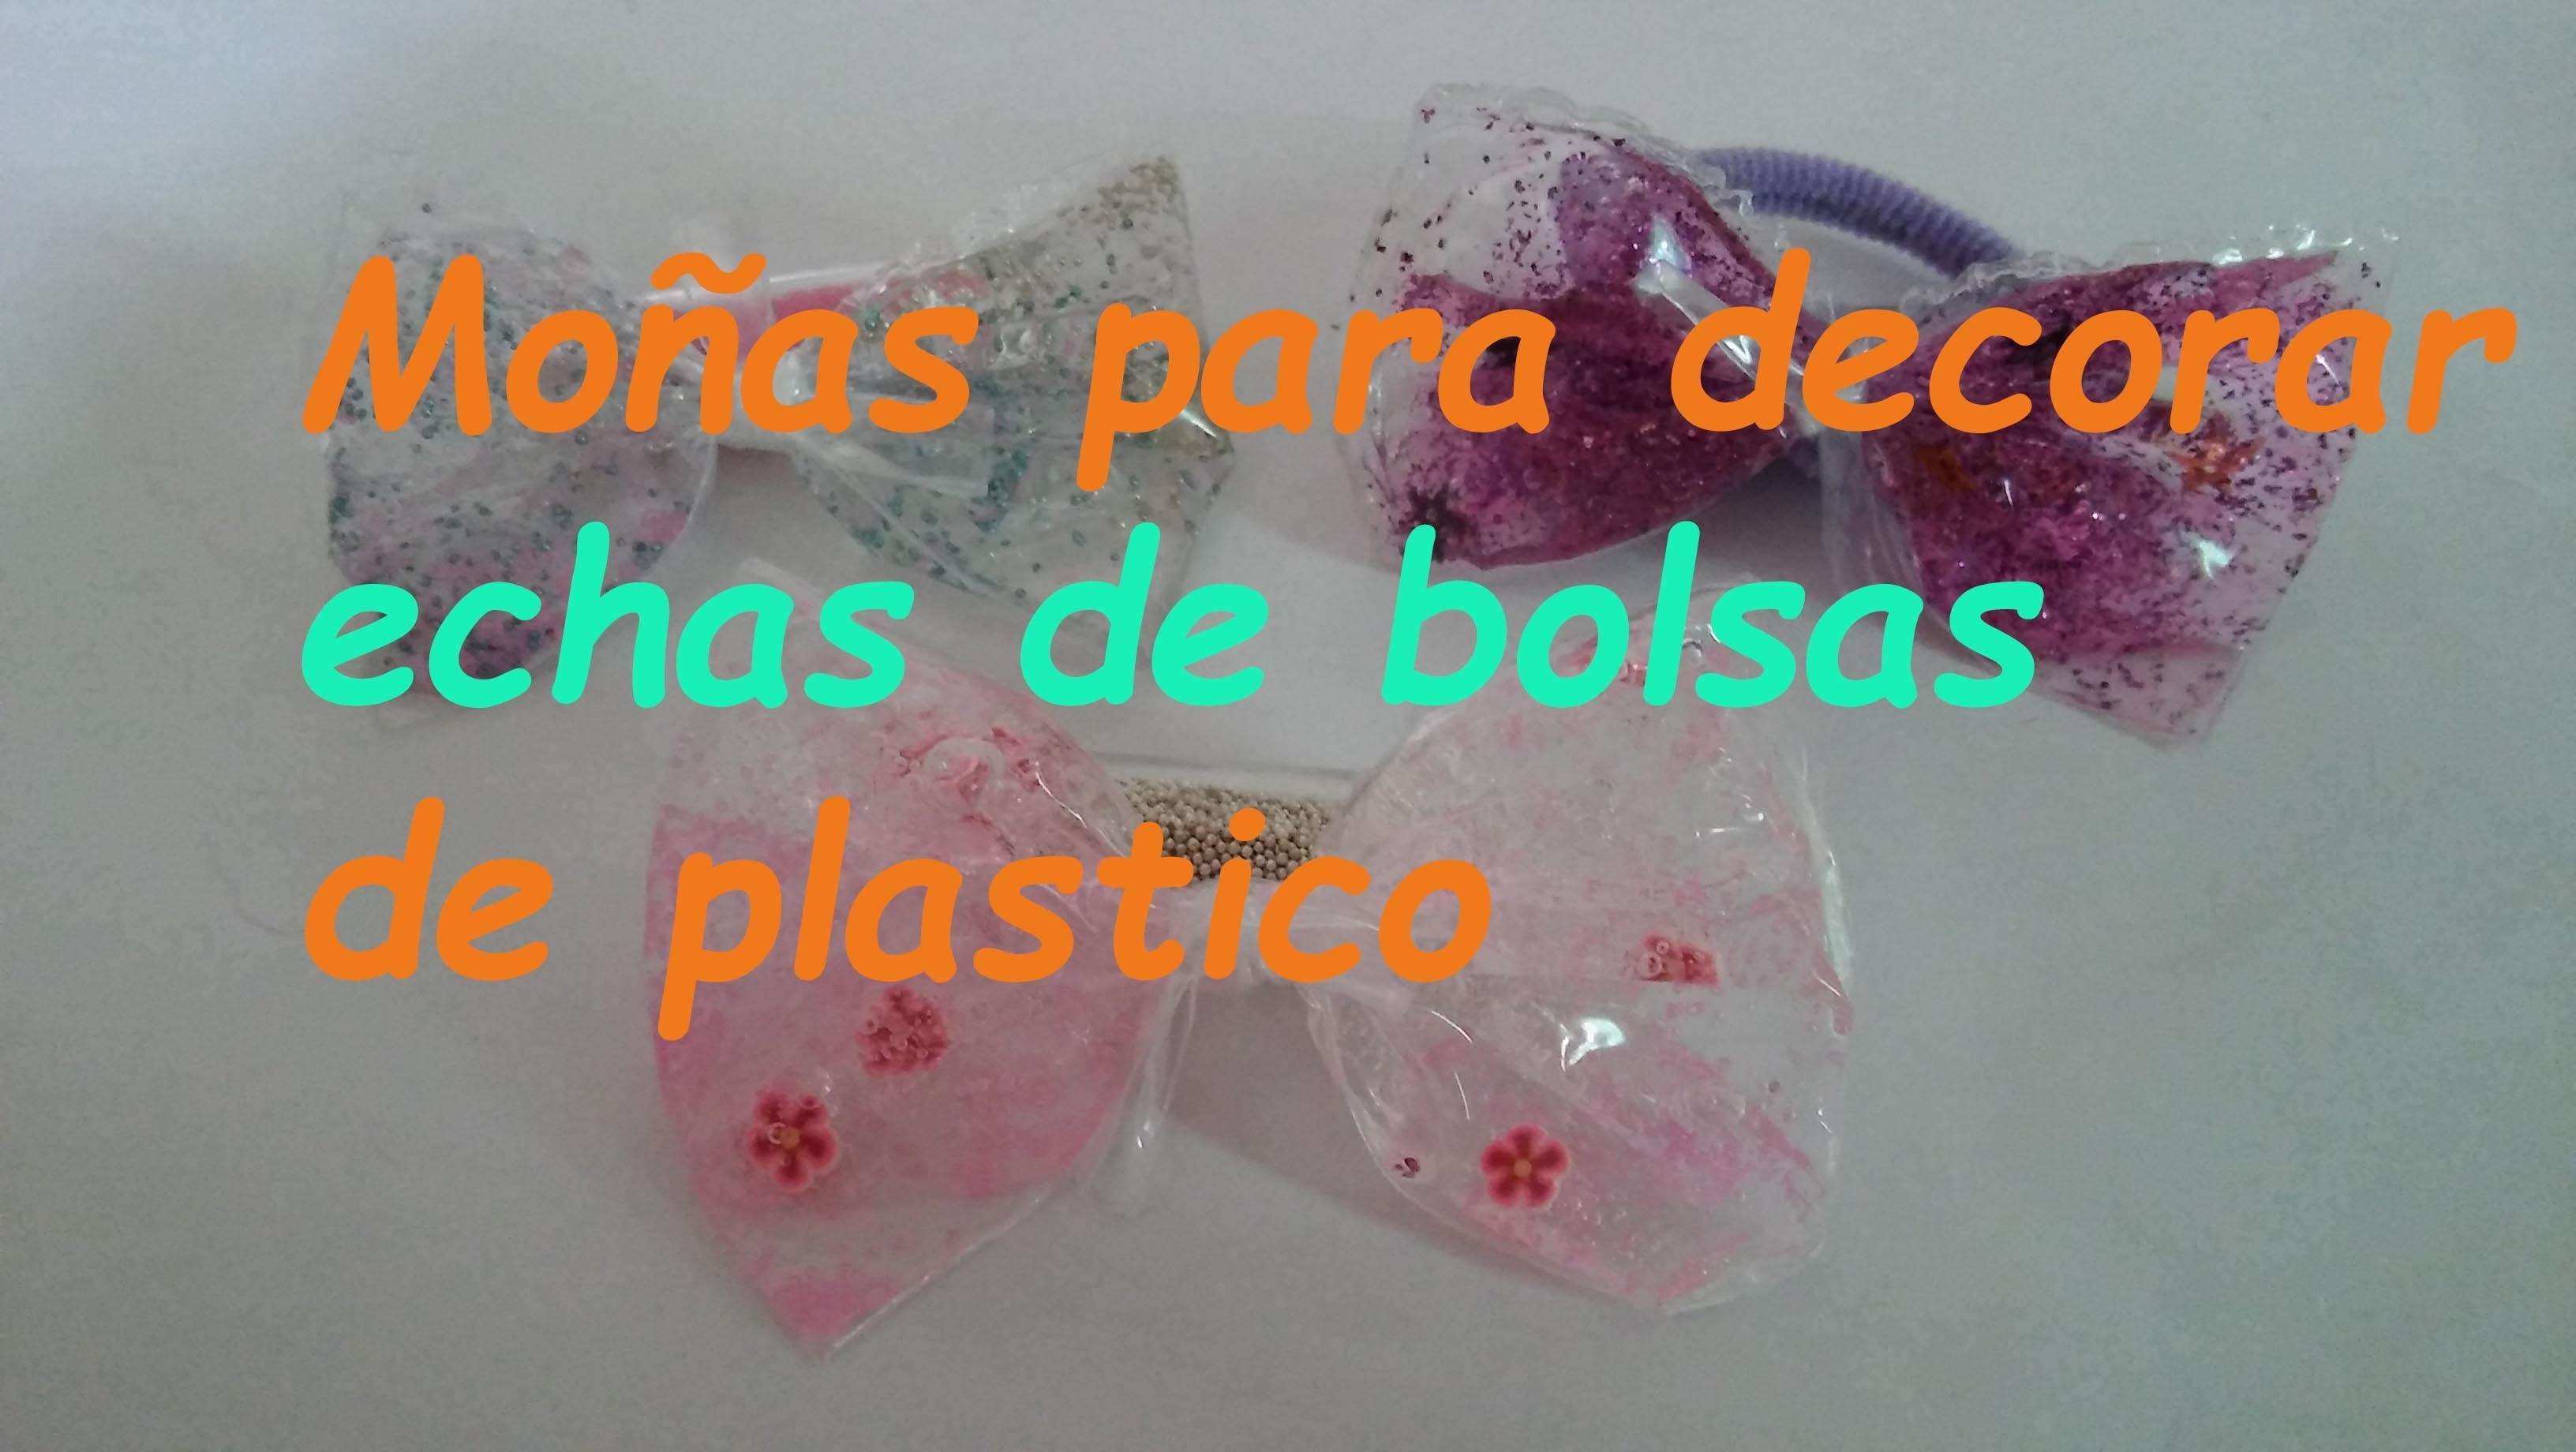 Moñas para decorar hechas de bolsas de plastico